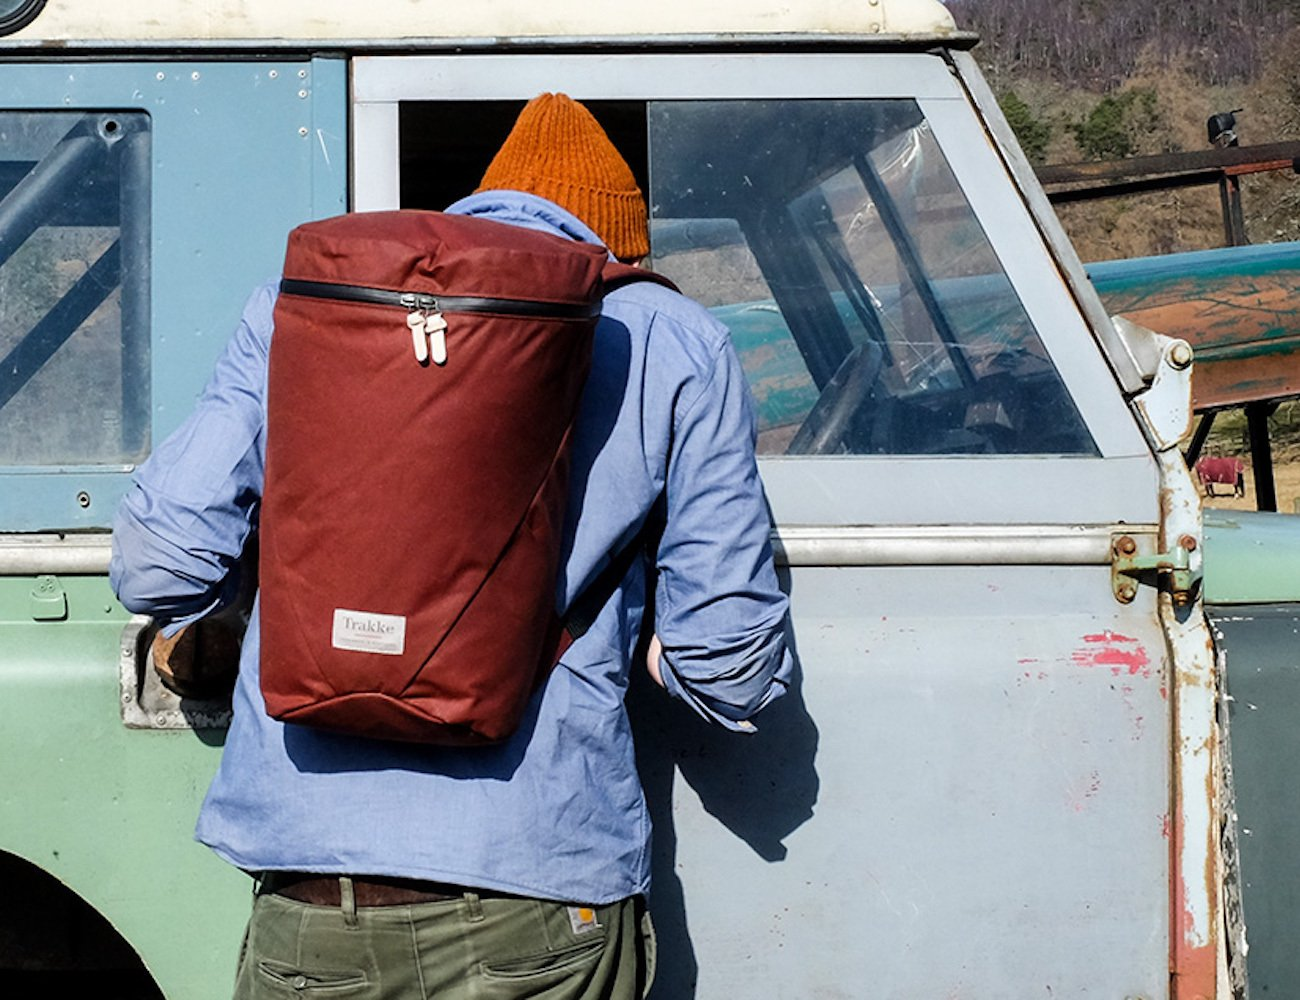 Trakke Lecht Adventure Backpack